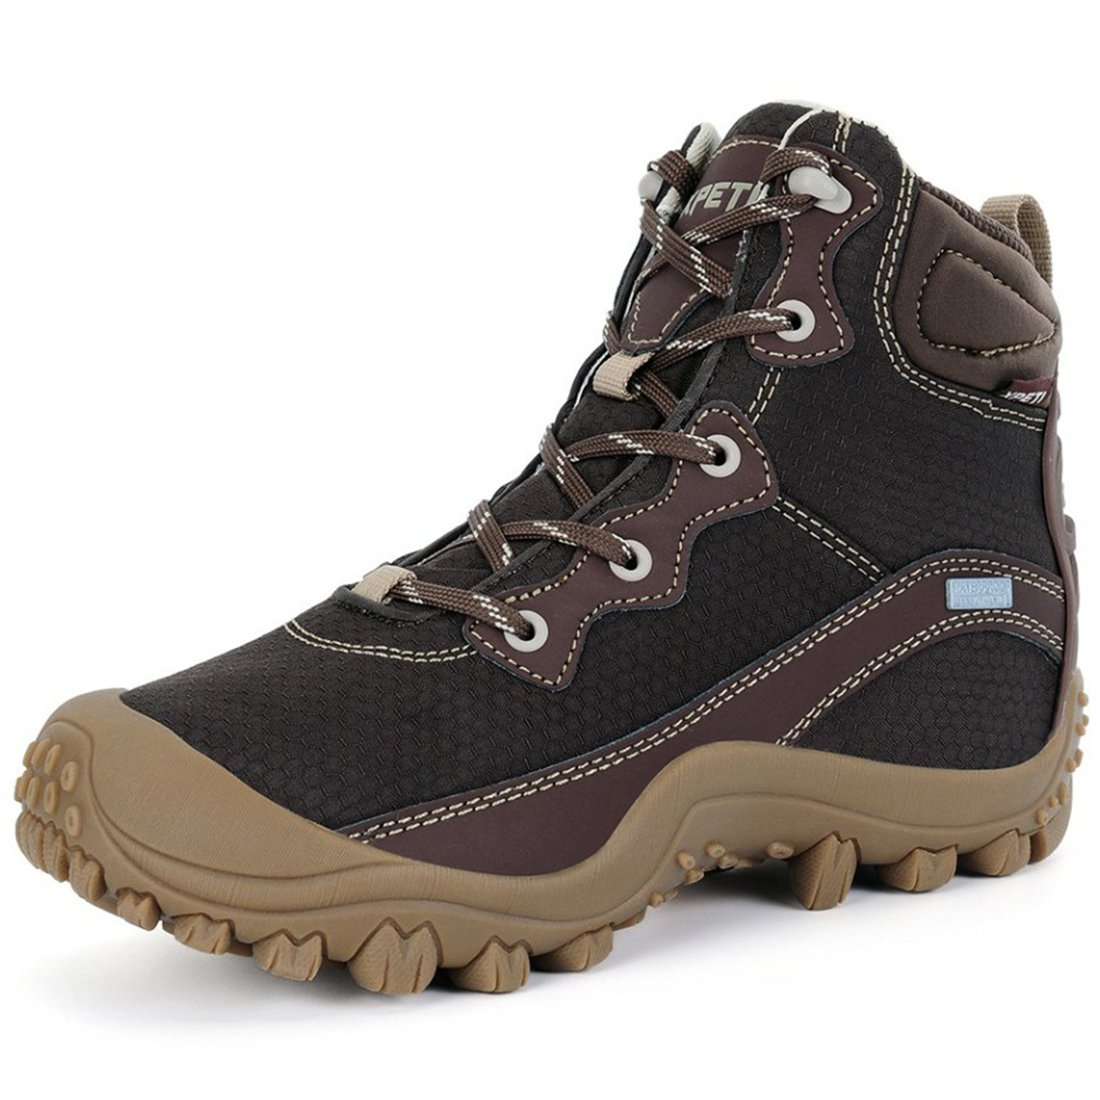 XPETI Women's Dimo Mid Waterproof Lightweight Hiking Trekking Walking Camping Trail Anti-Slip Outdoor Work Boot Coffee 6